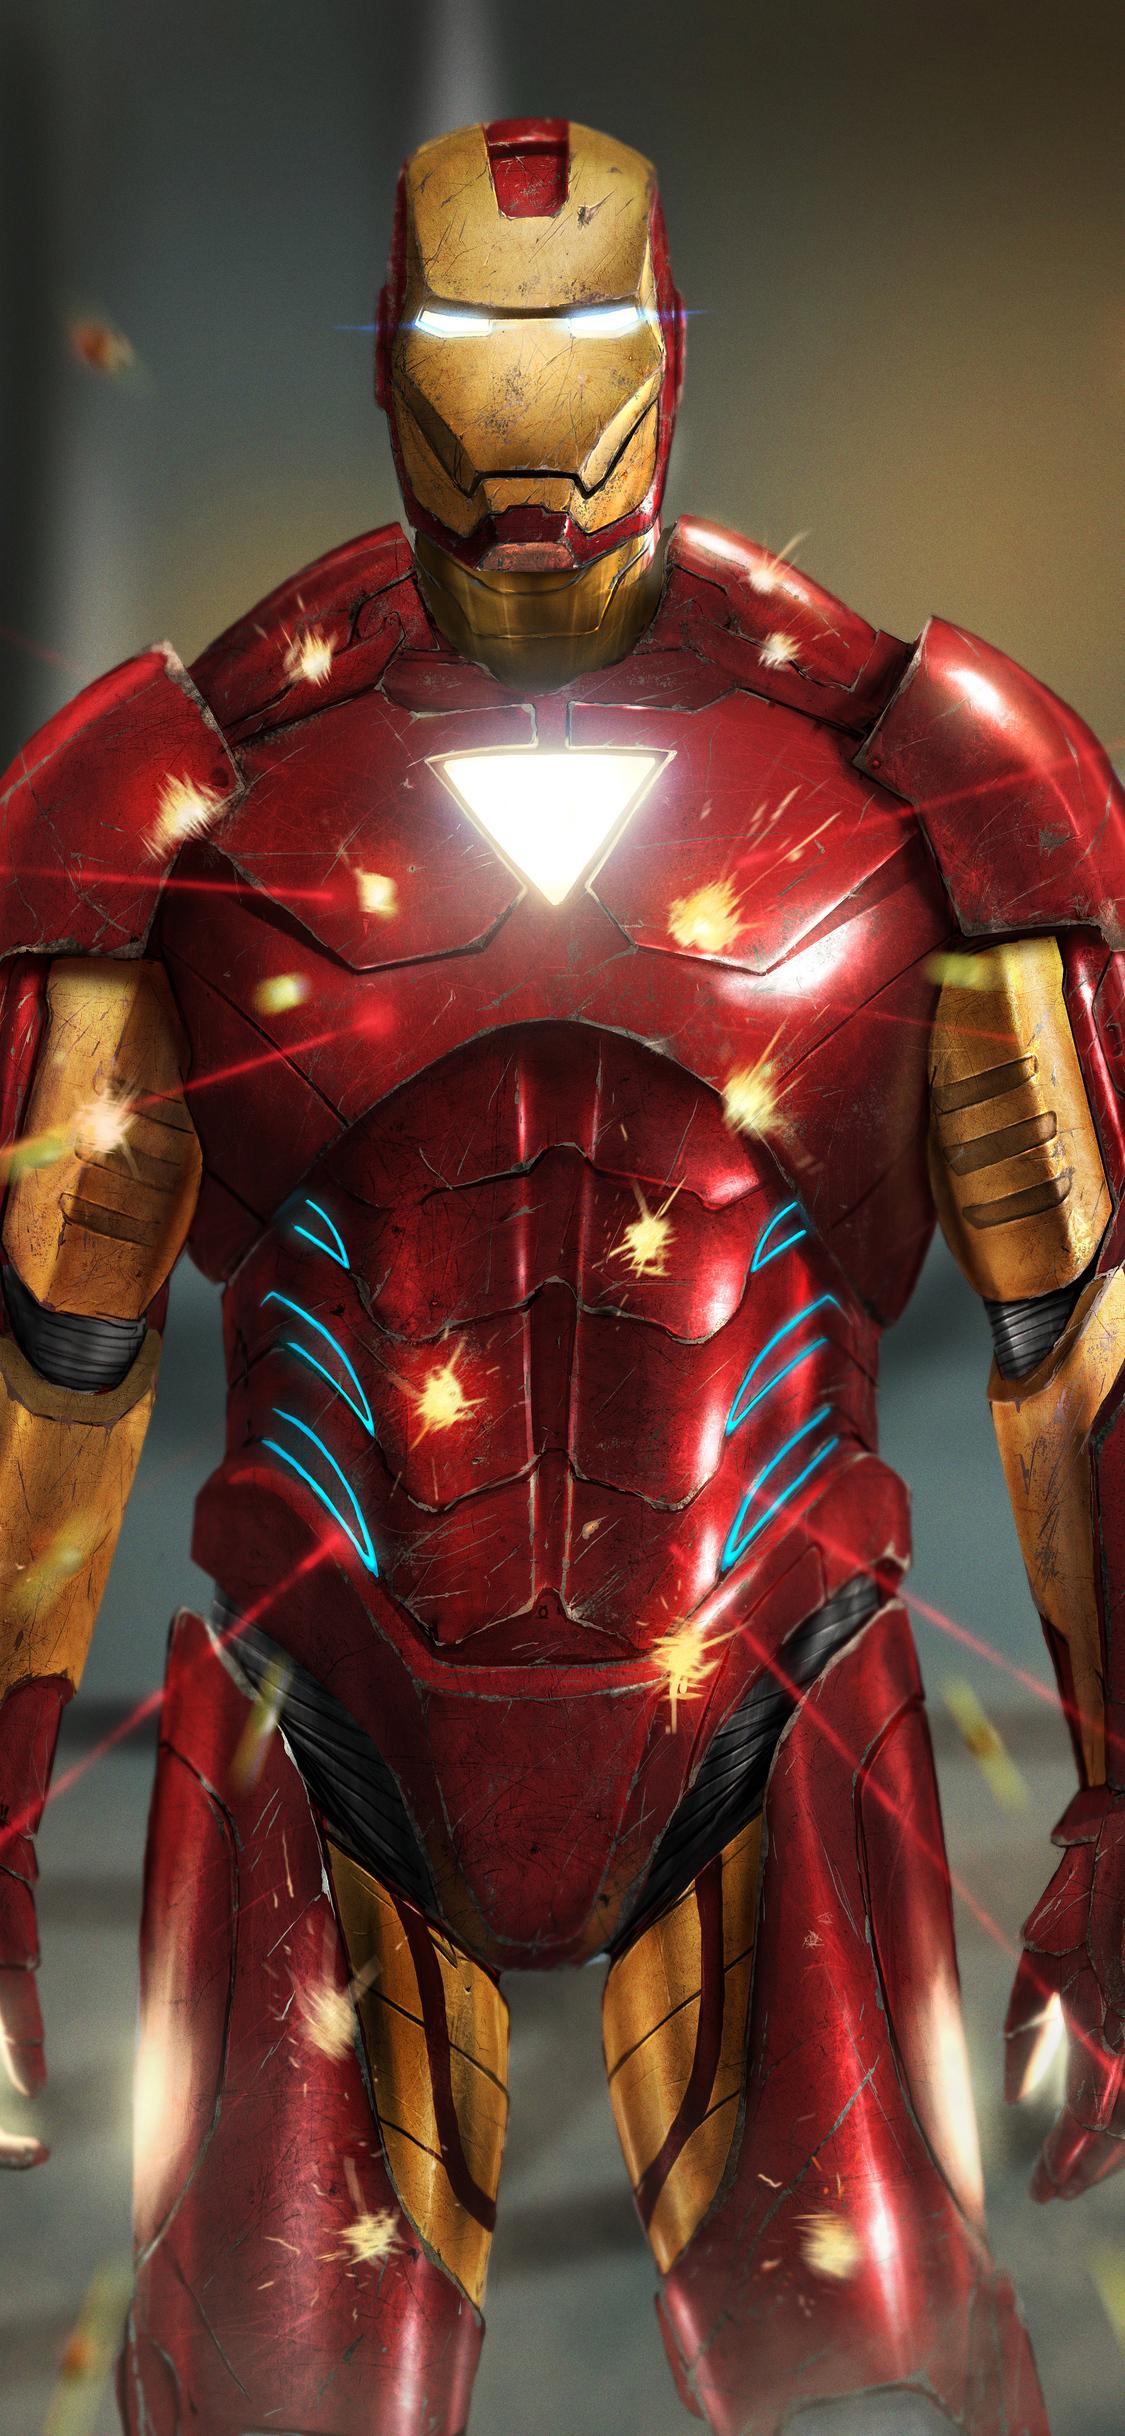 1125x2436 Iron Man Artwork 4k New Iphone XS,Iphone 10 ...